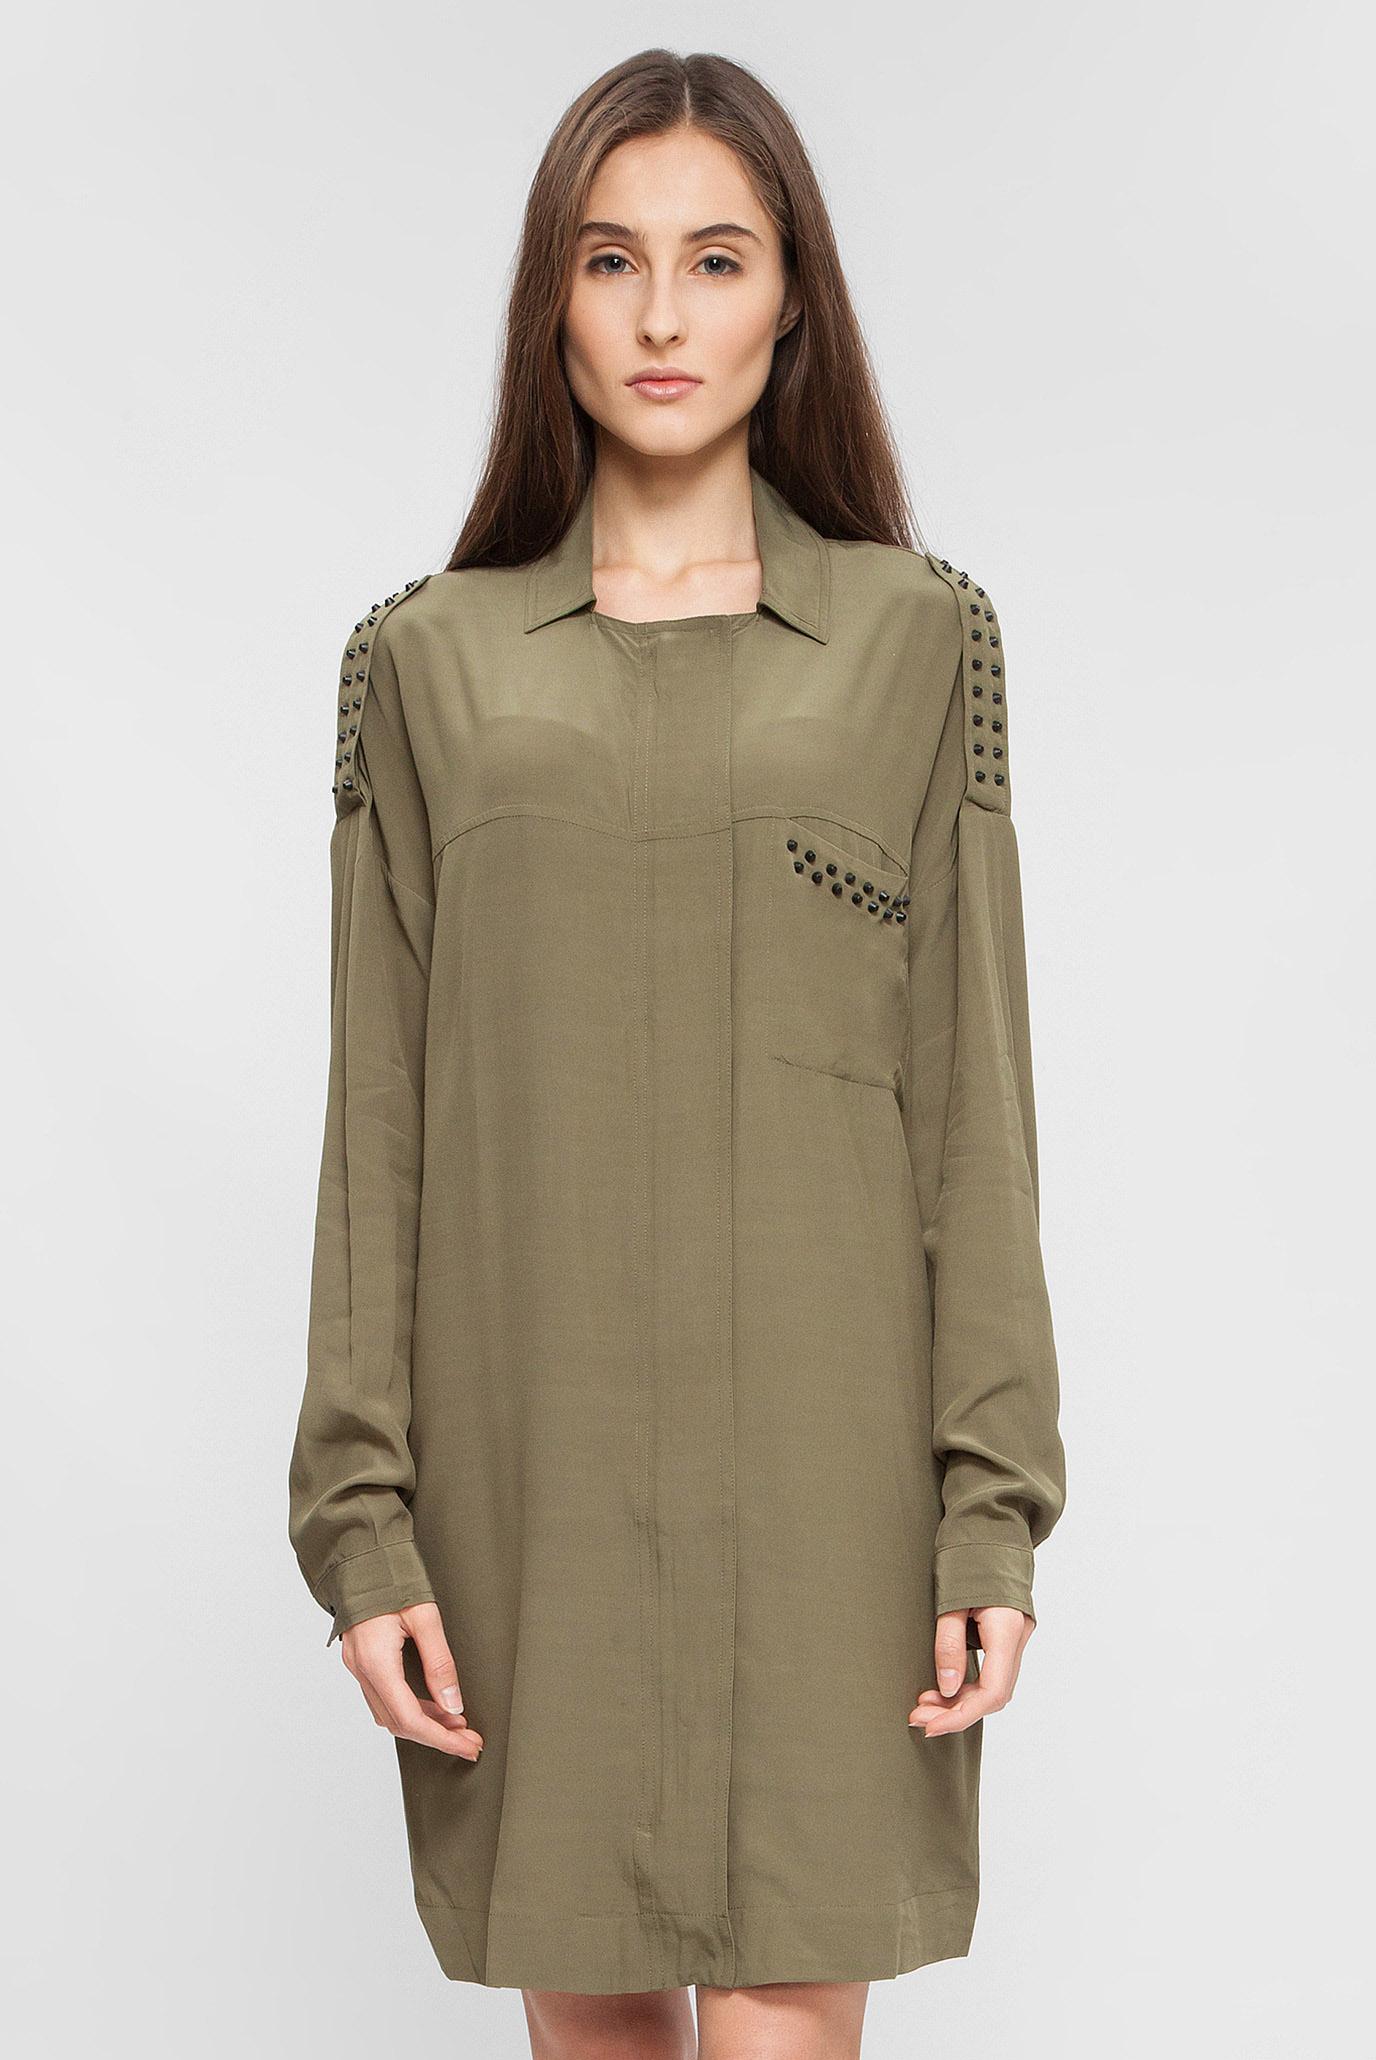 06b2b10f8bf Купить Женское зеленое платье-рубашка Replay Replay W9429 .000.82890 –  Киев